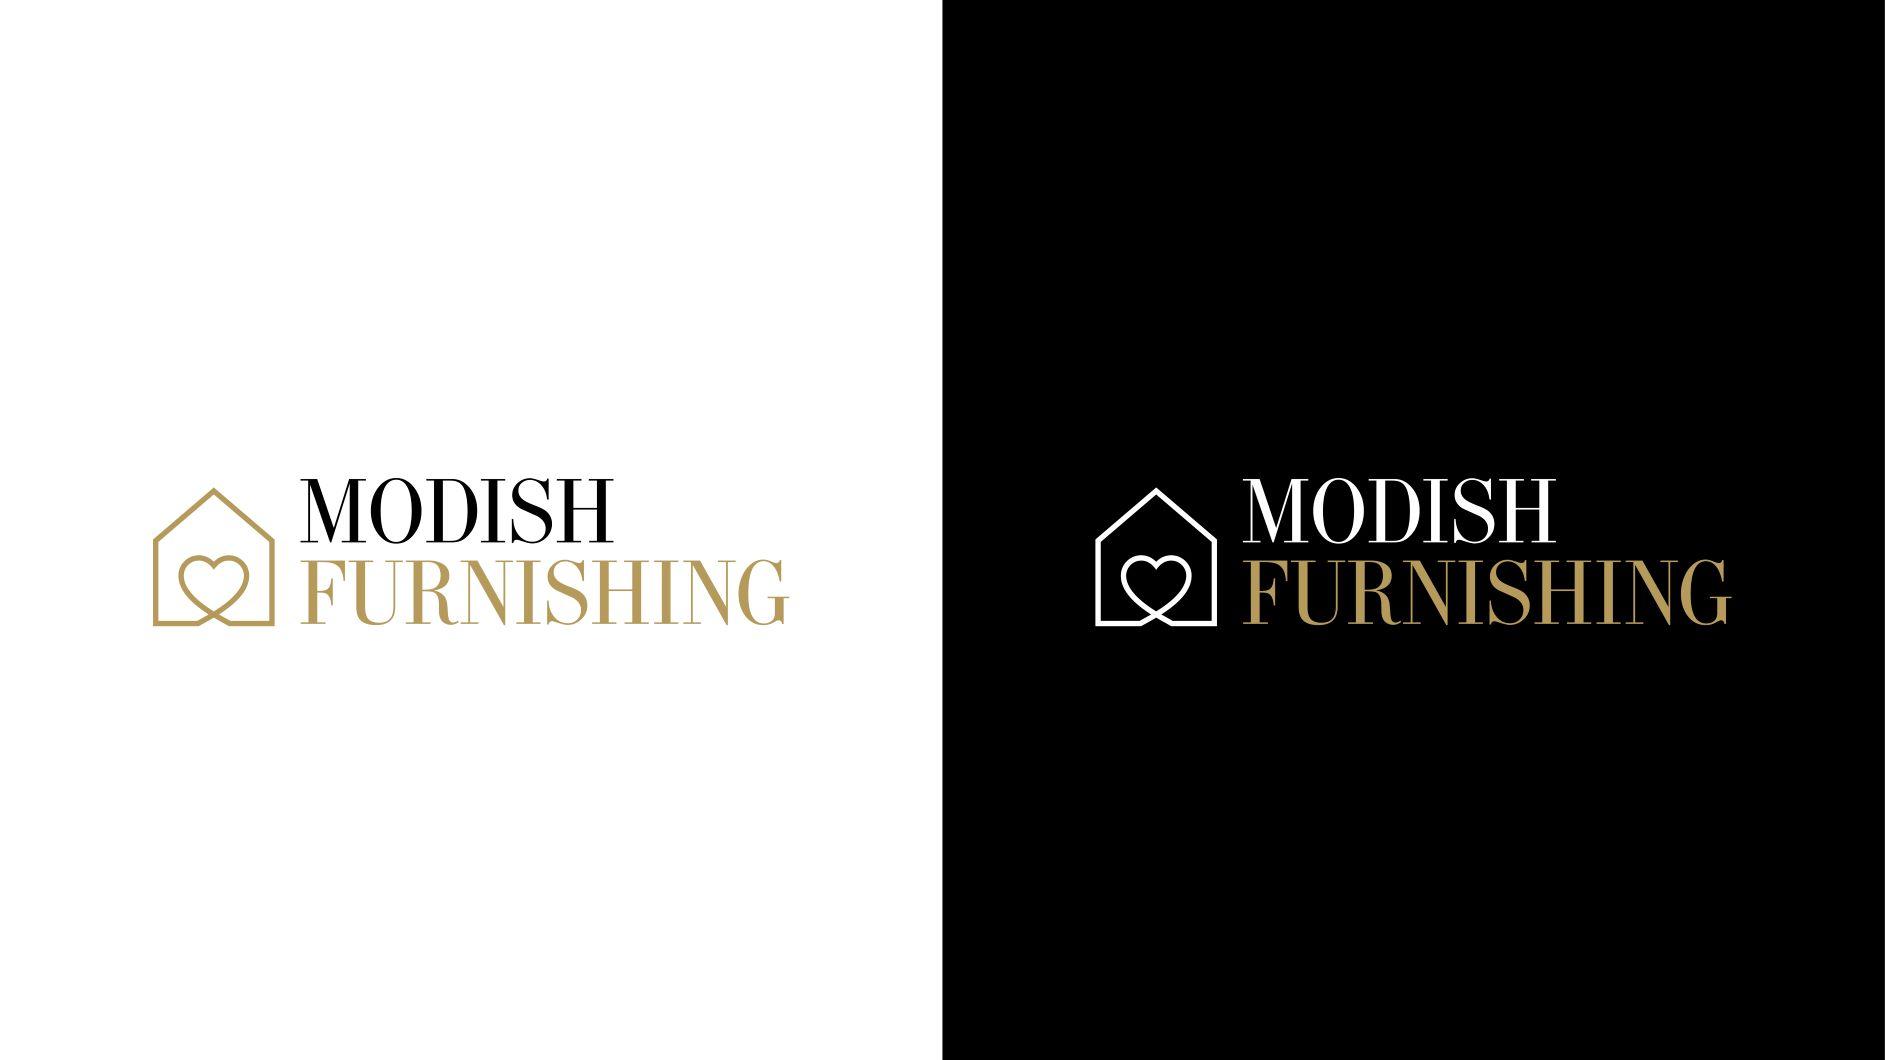 Modish Furnishing Branding Project